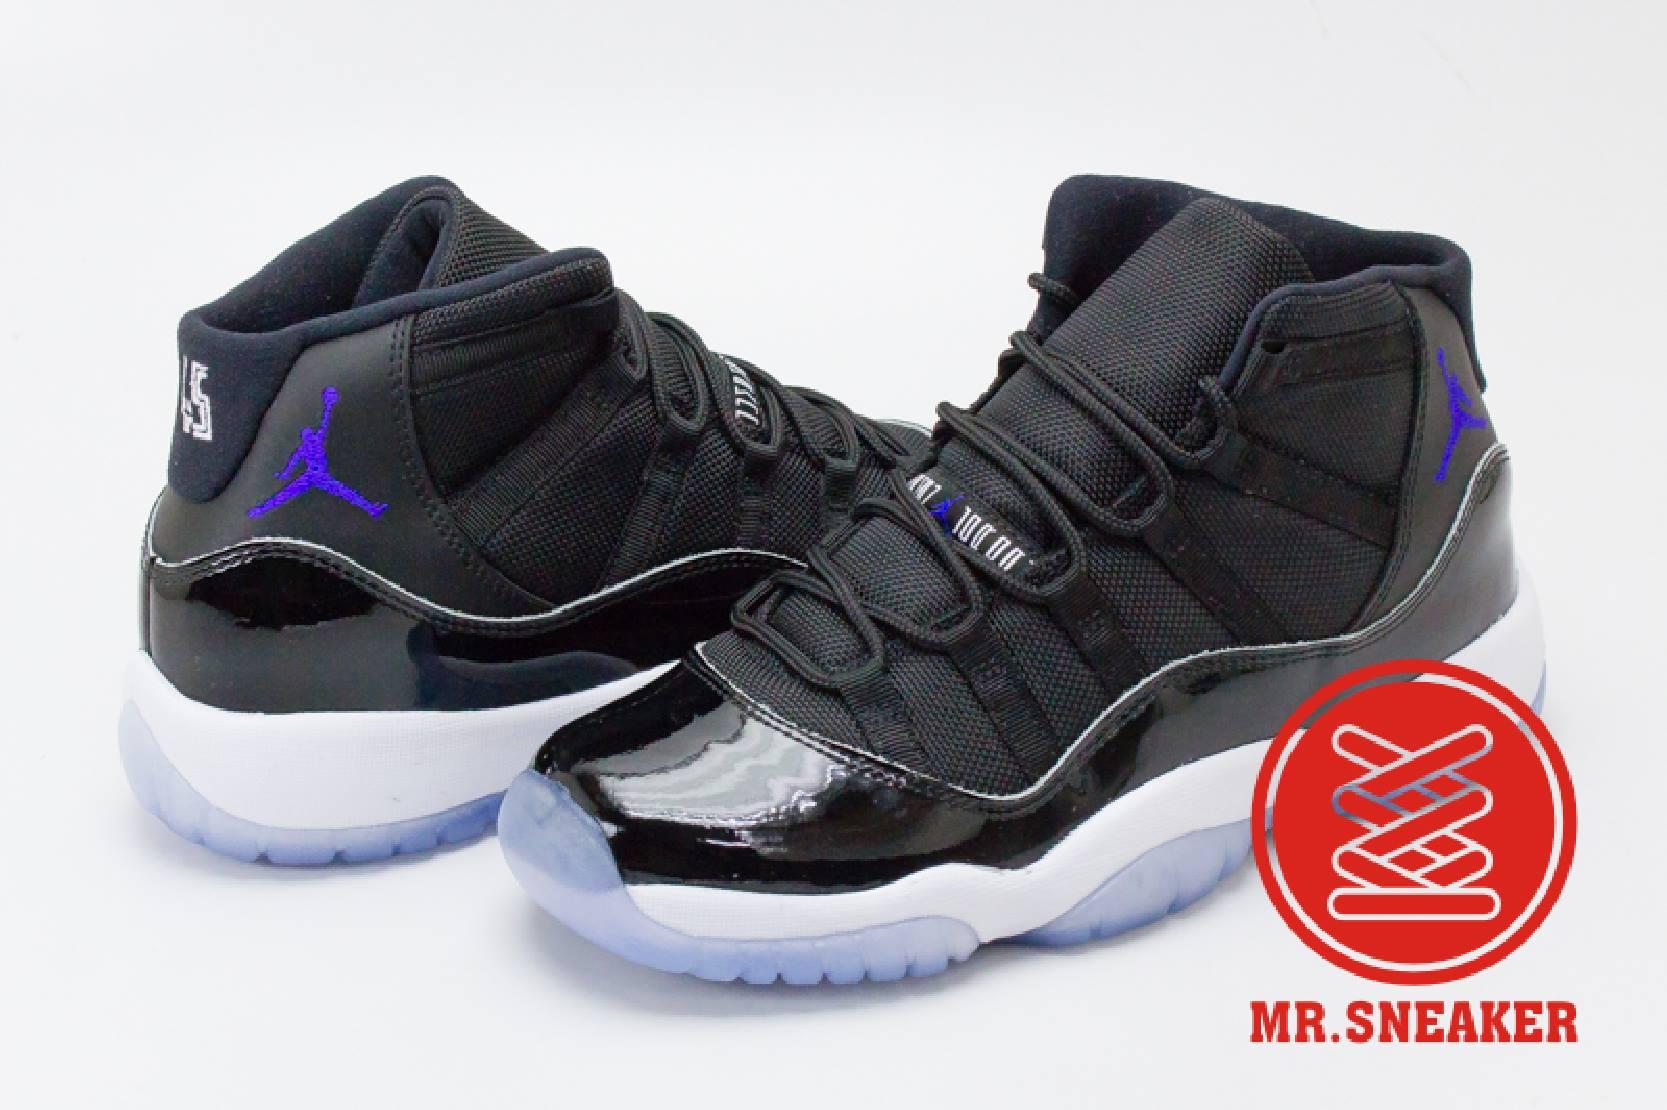 ☆Mr.Sneaker☆ NIKE Air Jordan 11 AJ XI Space Jam 怪物奇兵 2016復刻 現貨 GS